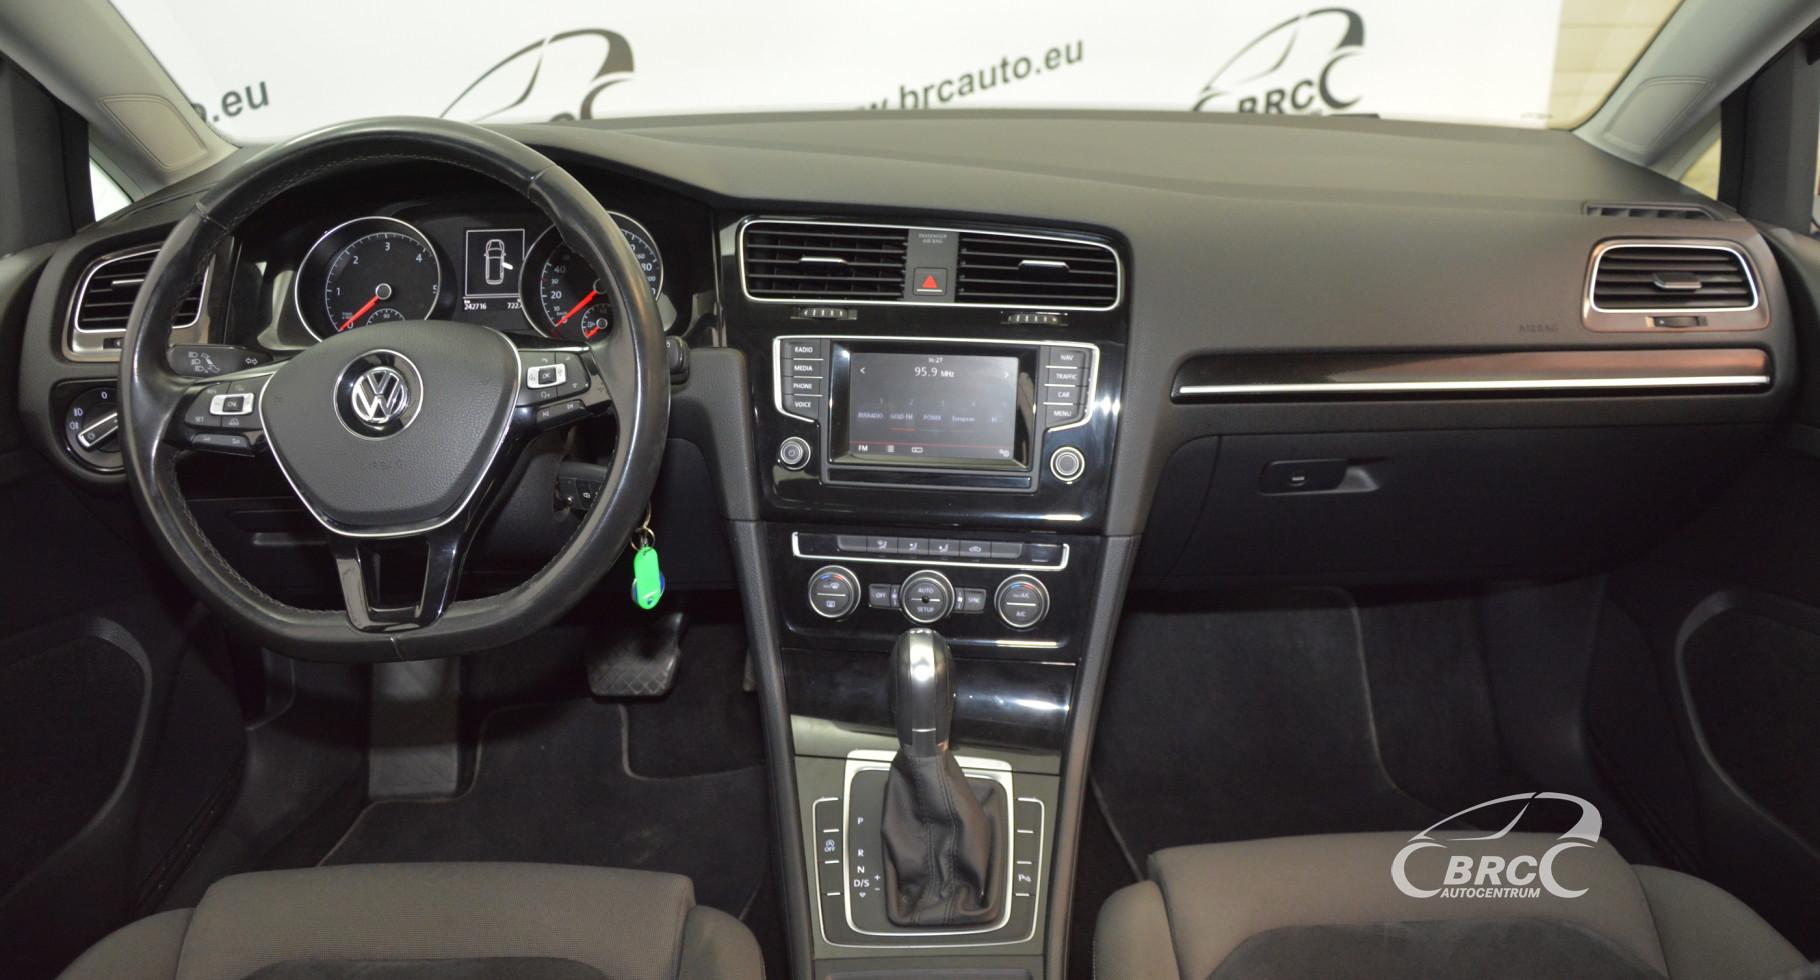 Volkswagen Golf 2.0 TDI Automatas